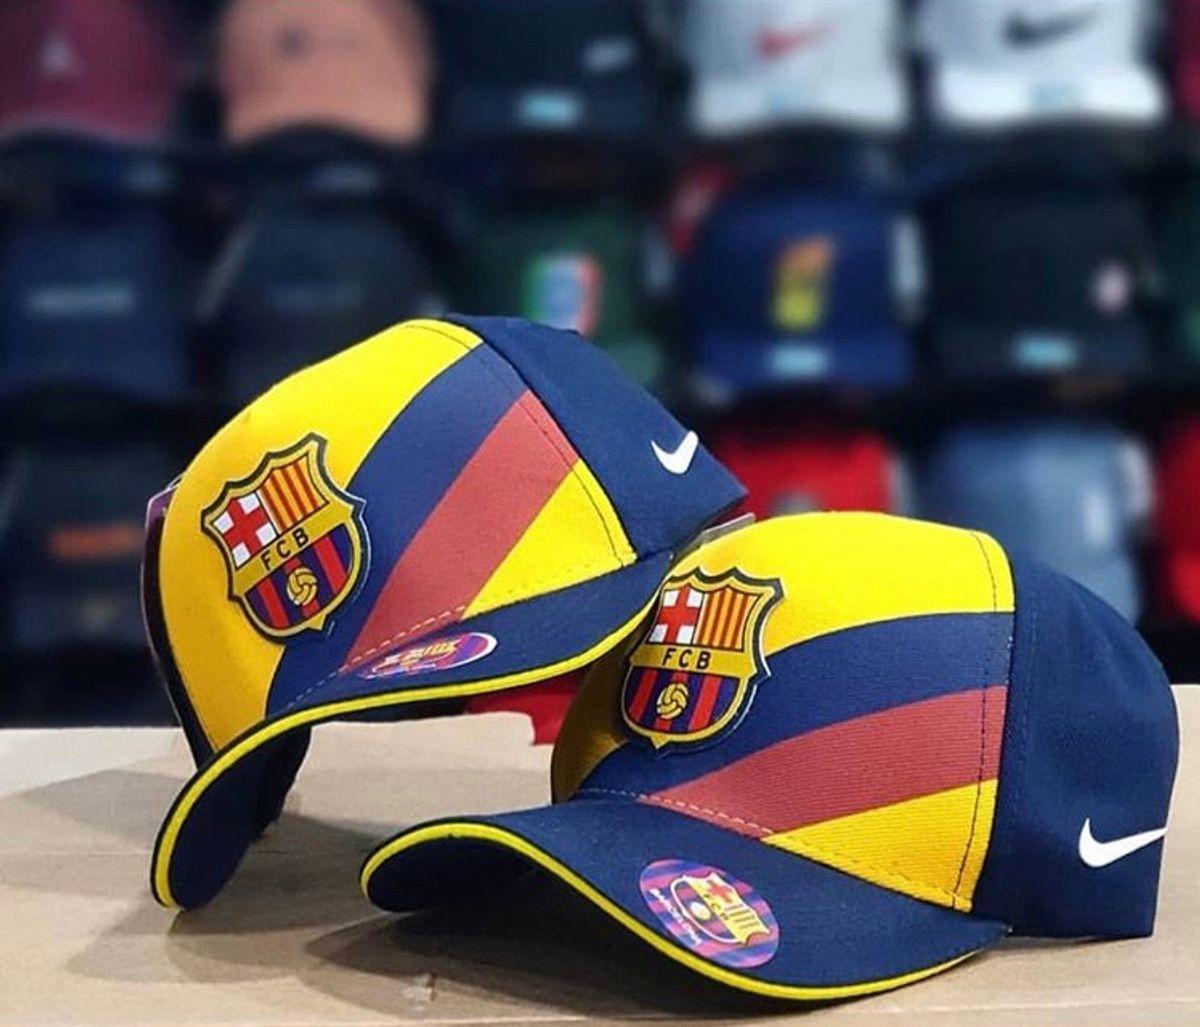 verdad Especialmente estrecho  Boné Barcelona Nike 2020 | Chapéu Masculino Nike Nunca Usado 41037989 |  enjoei